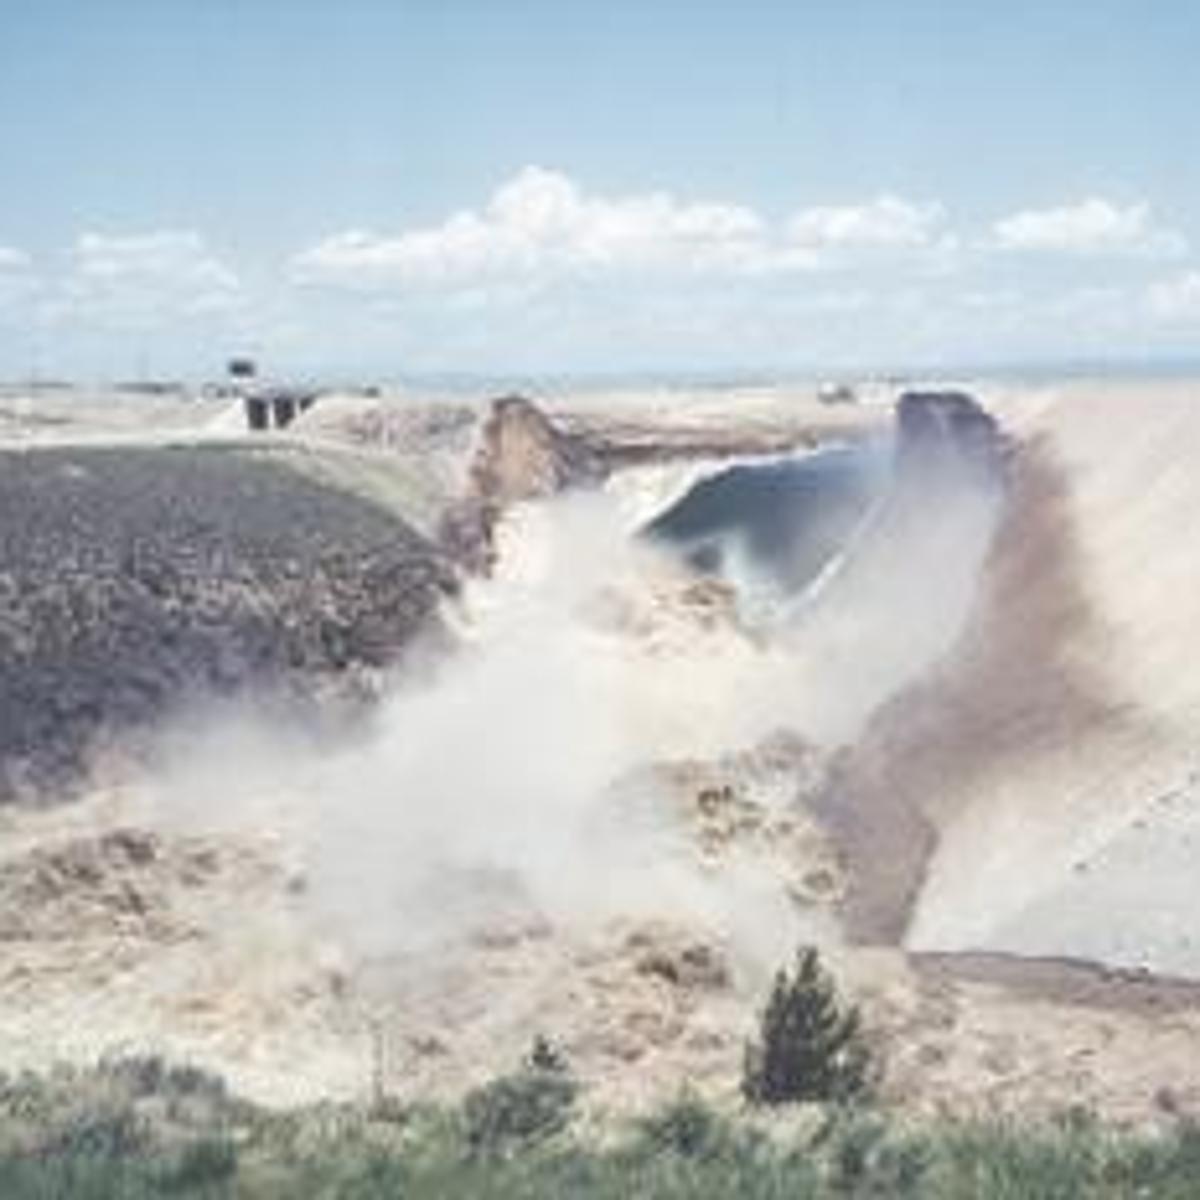 Teton Dam rebuild option in water storage study | News